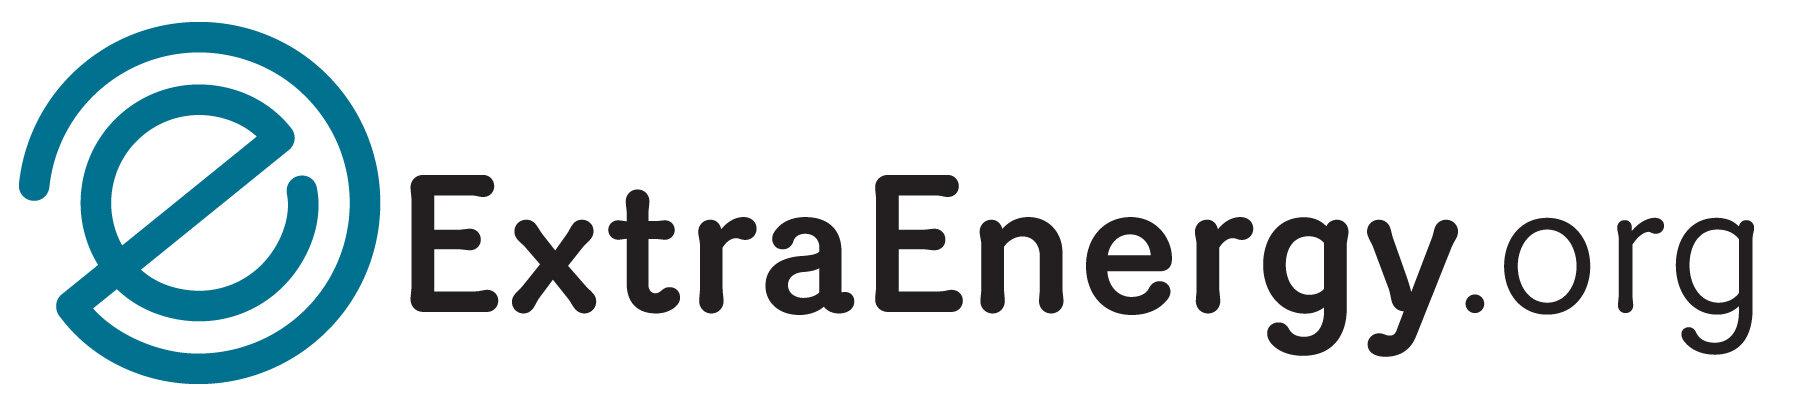 Extraenergy_logo.jpg